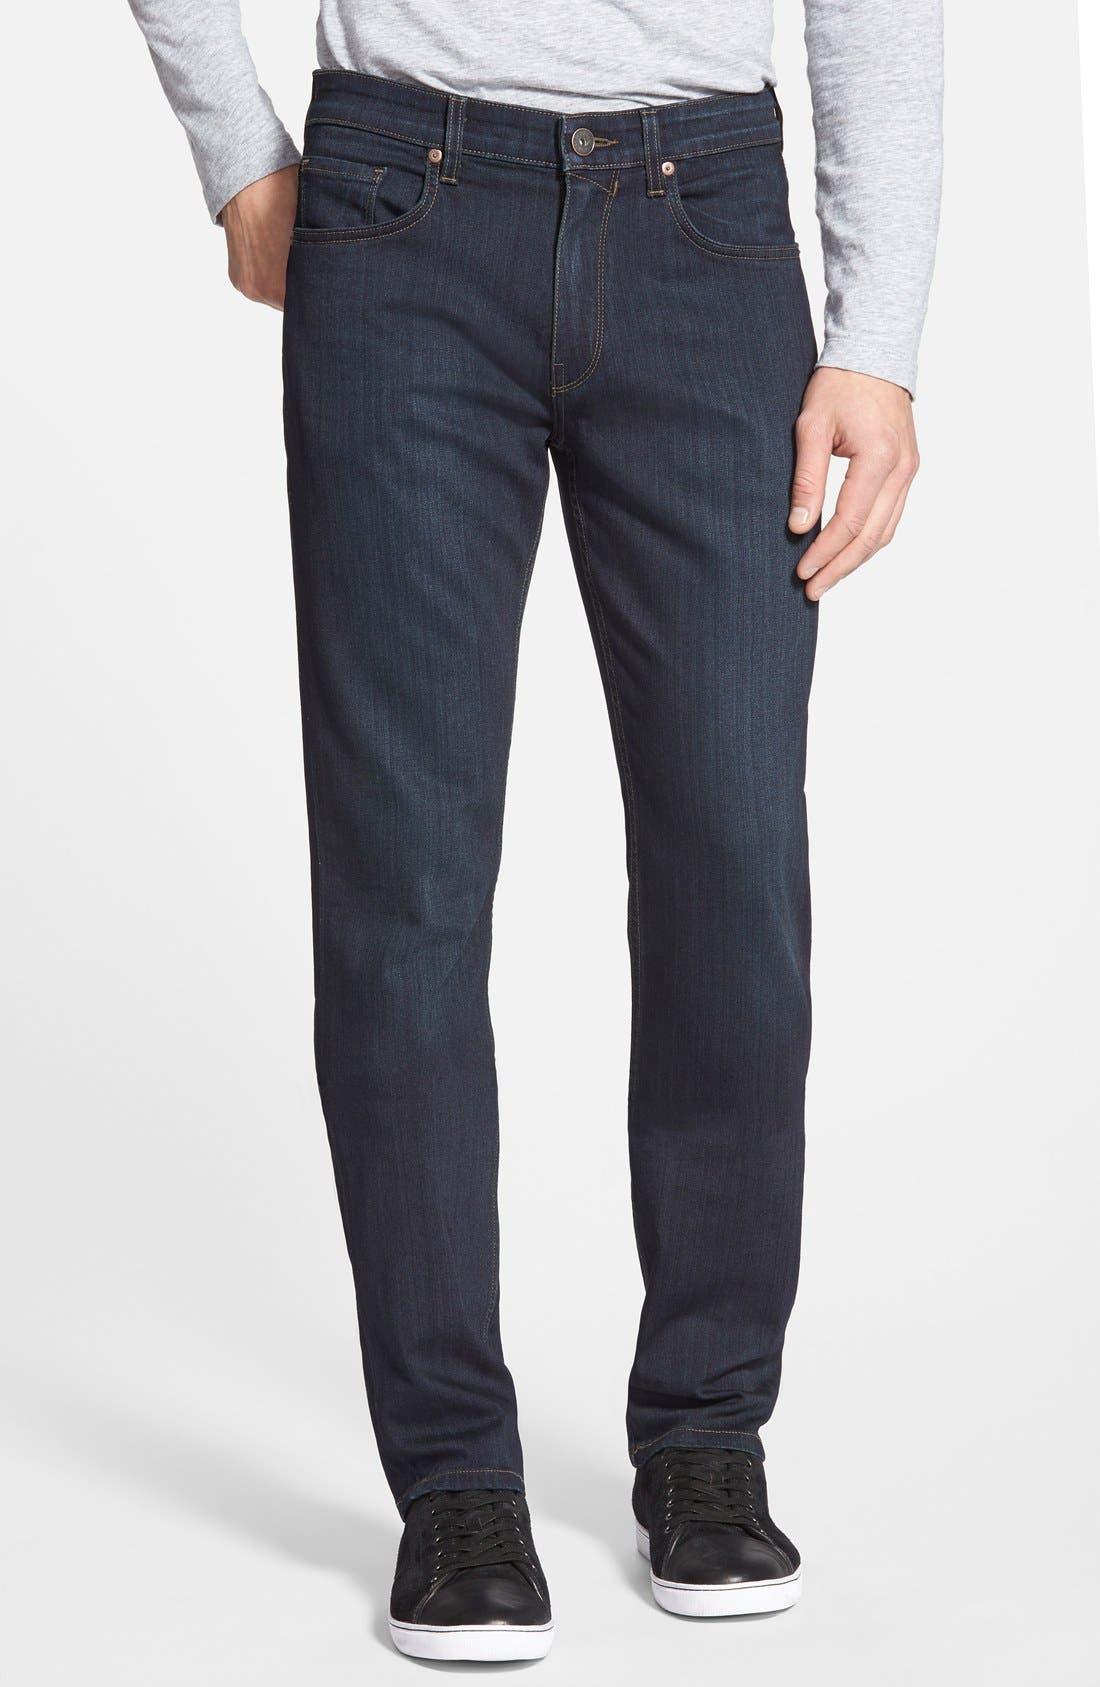 PAIGE, Transcend - Federal Slim Straight Leg Jeans, Main thumbnail 1, color, CELLAR/ CELLAR